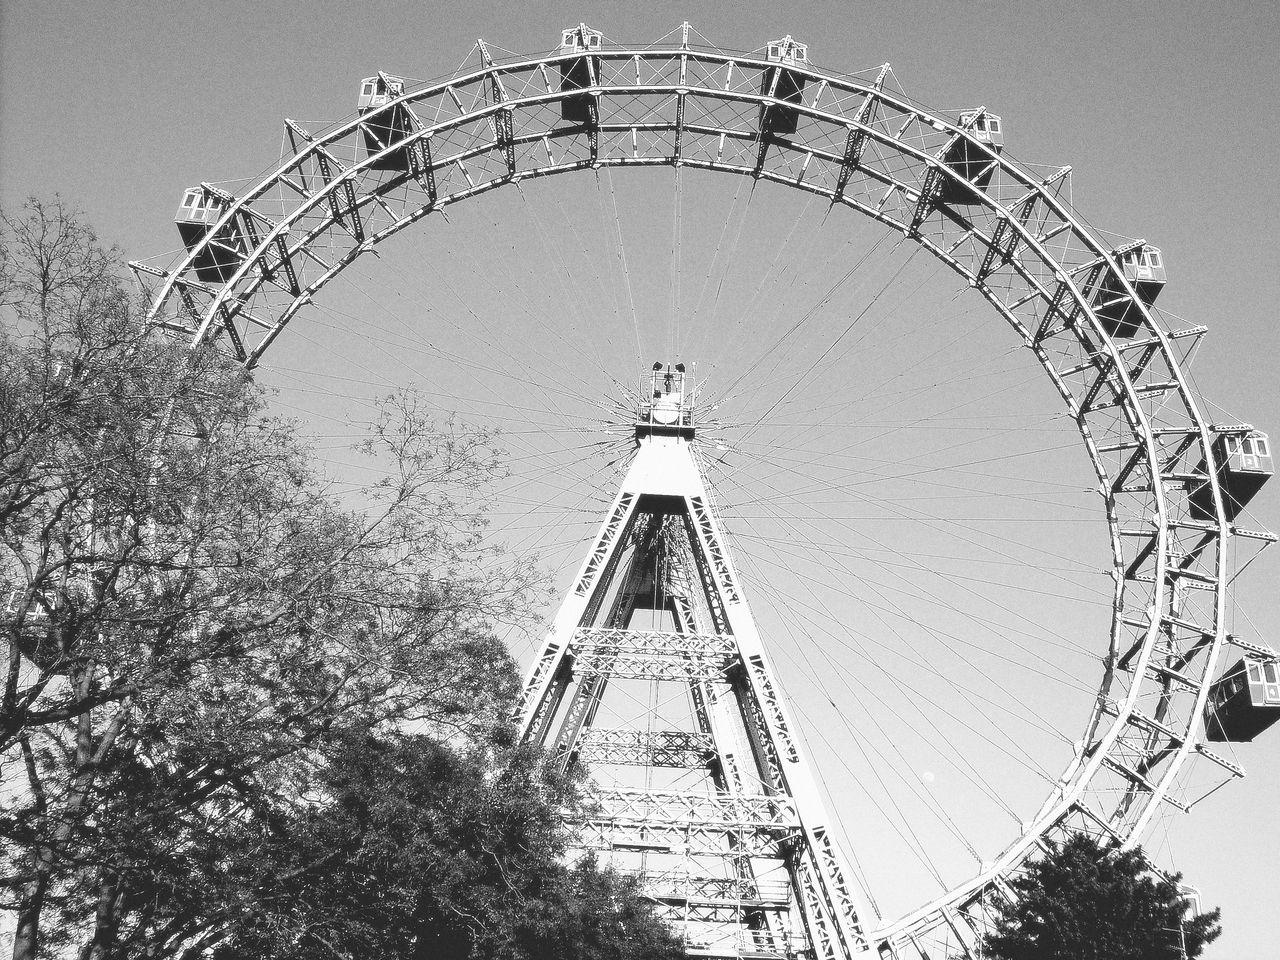 Amusement Park Amusement Park Ride Big Wheel Day Ferris Wheel Low Angle View No People Outdoors Riesenrad Riesenrad Wien Sky